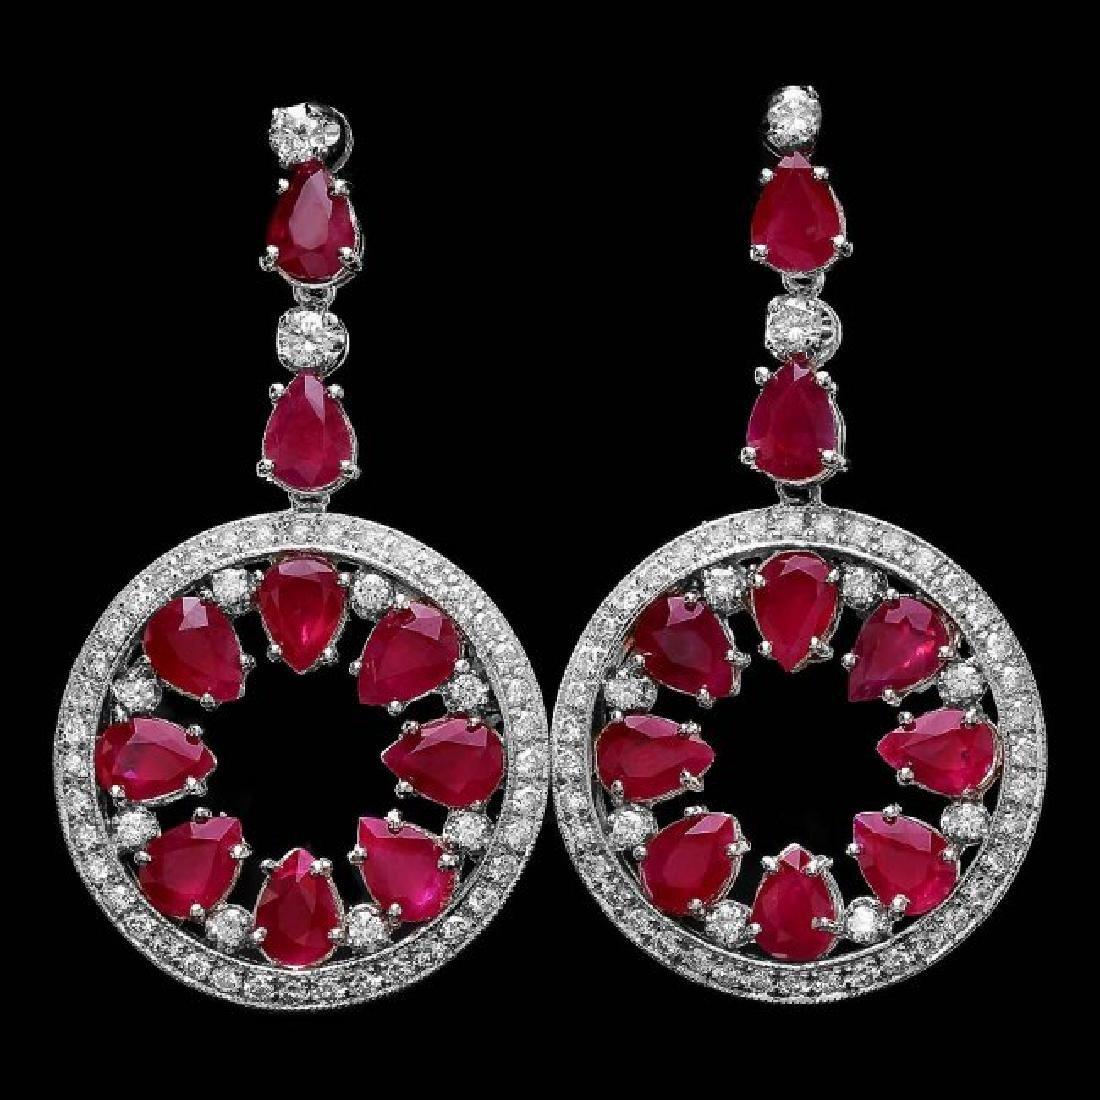 14k Gold 18.50ct Ruby 1.60ct Diamond Earrings - 3